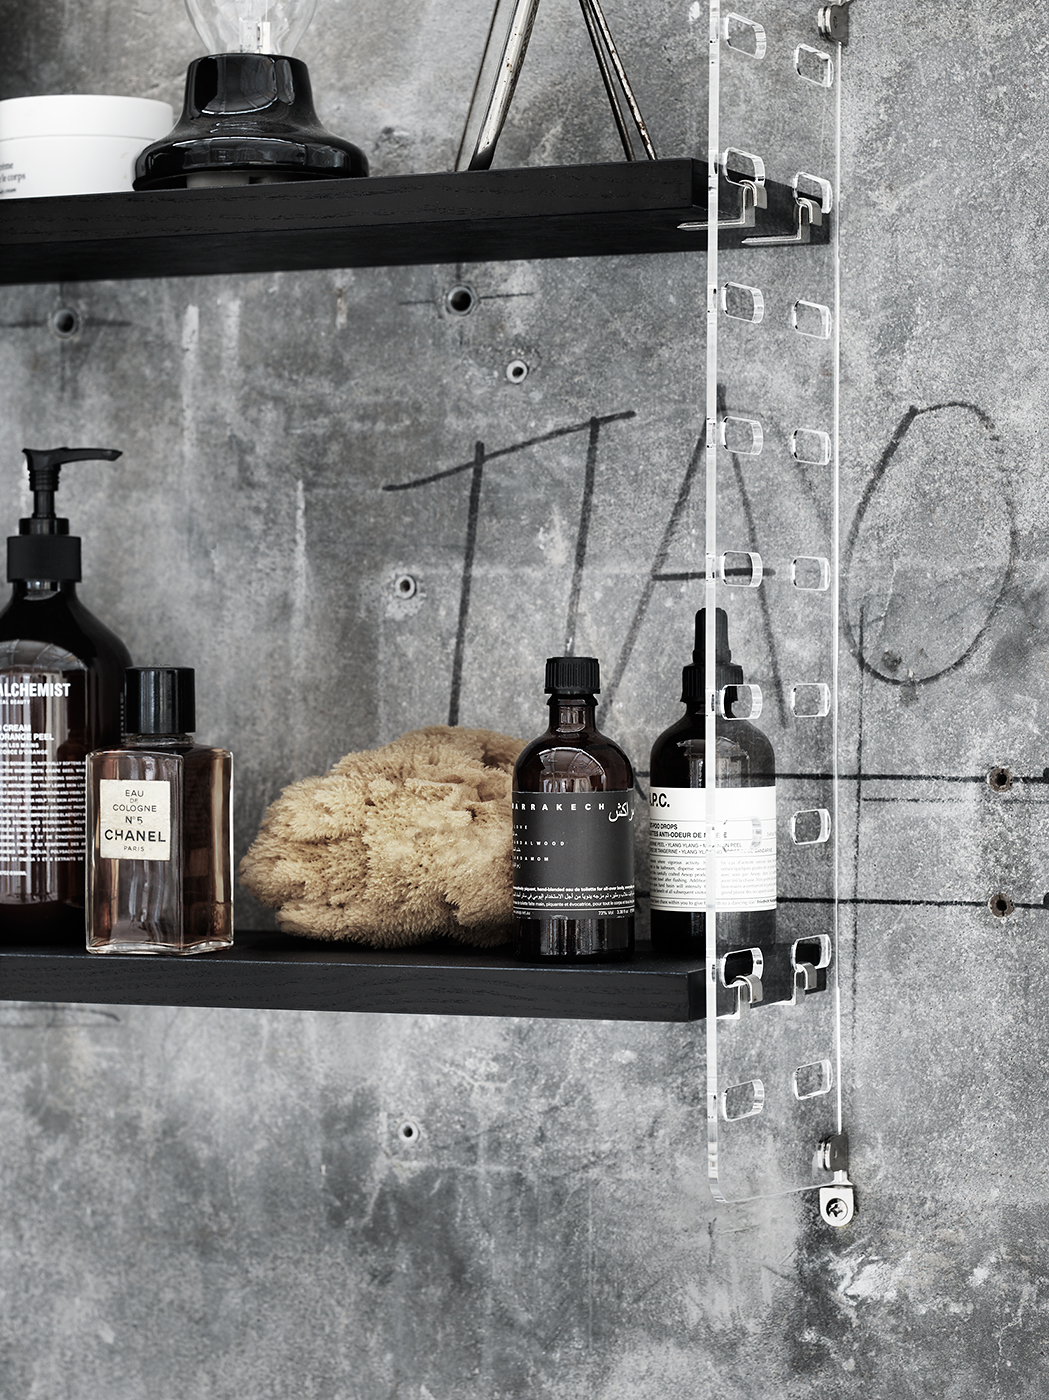 String_2016_Lotta_Agaton concrete bathroom